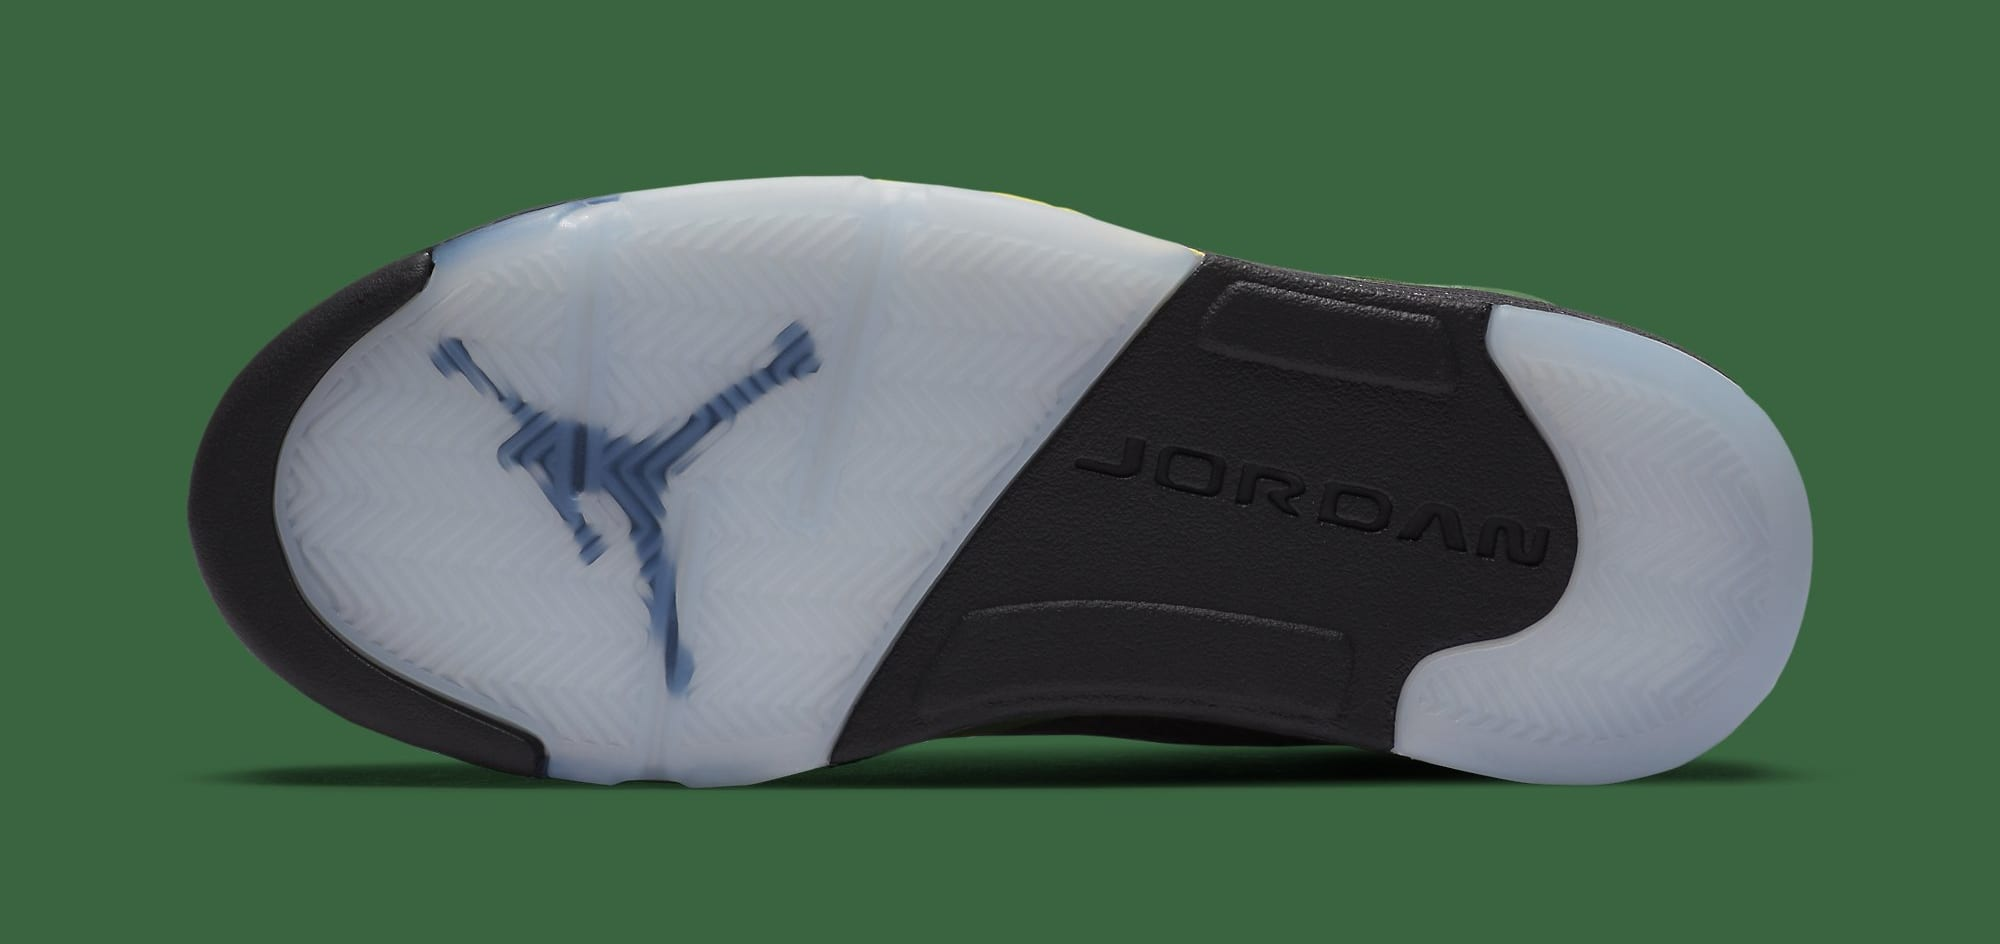 Air Jordan 5 Retro SE 'Oregon' CK6631-307 Outsole